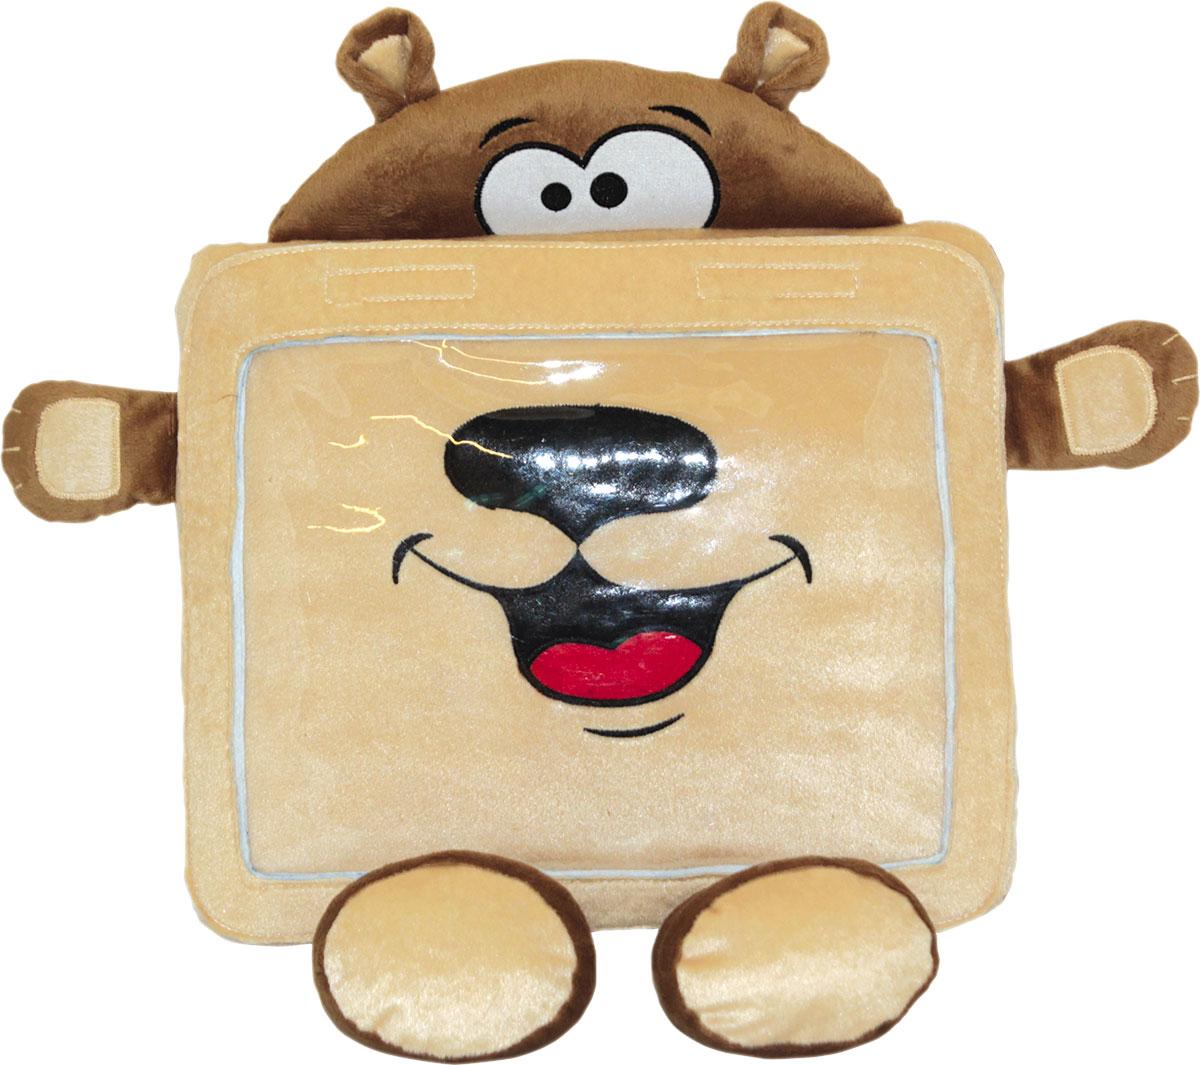 Gulliver Мягкая игрушка-чехол Мишка gulliver мягкая игрушка чехол мишка